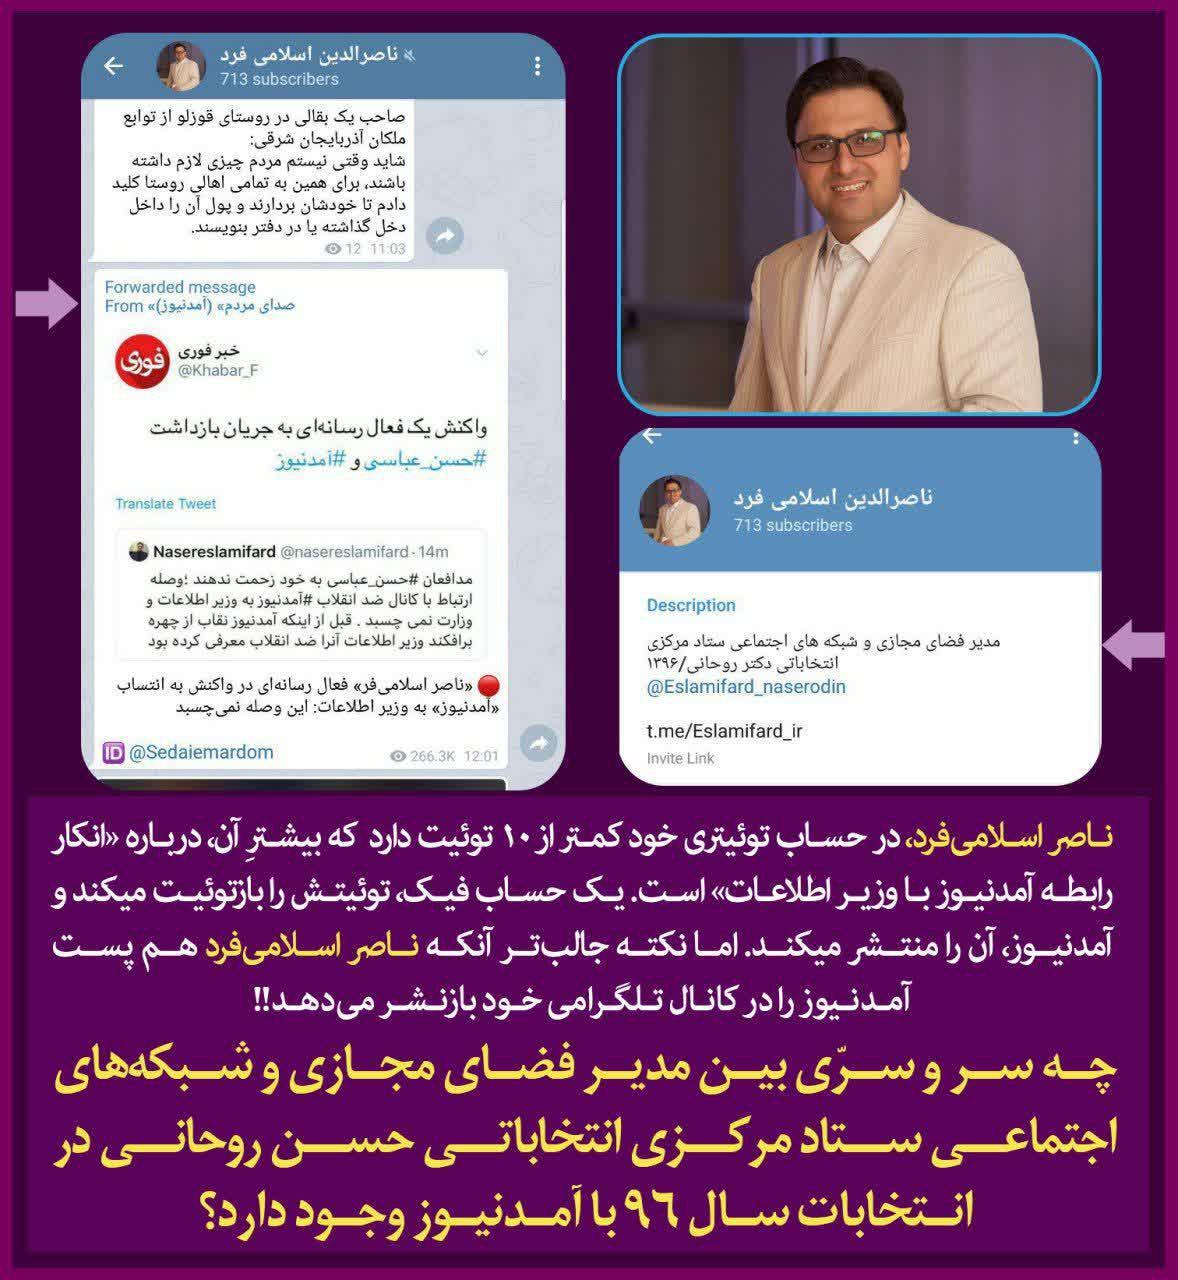 eslamifard%20%284%29 یک حساب گمنام جديد و تو و تازه تاسیس توئیت میکند، آمدنیوز انعکاس میدهد